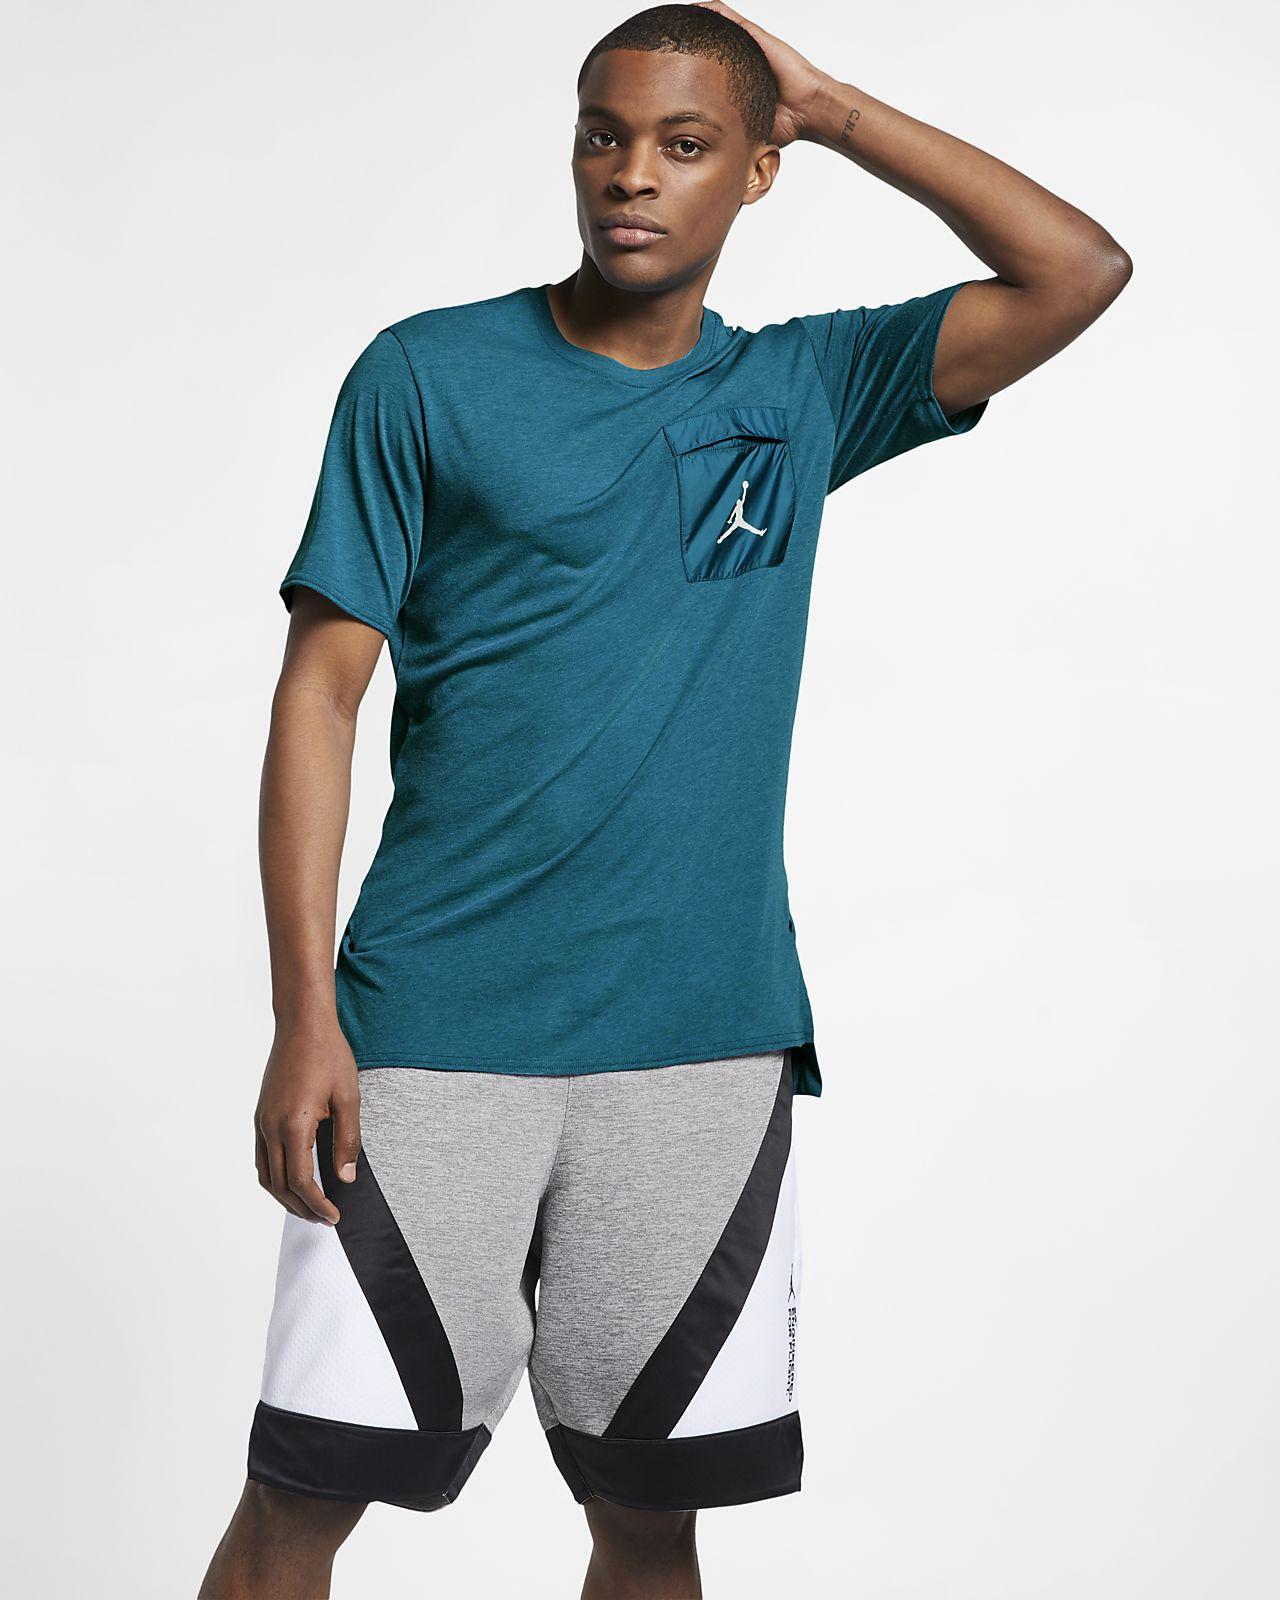 Jordan 23 Engineered Cool Men's Short-Sleeve Training Top